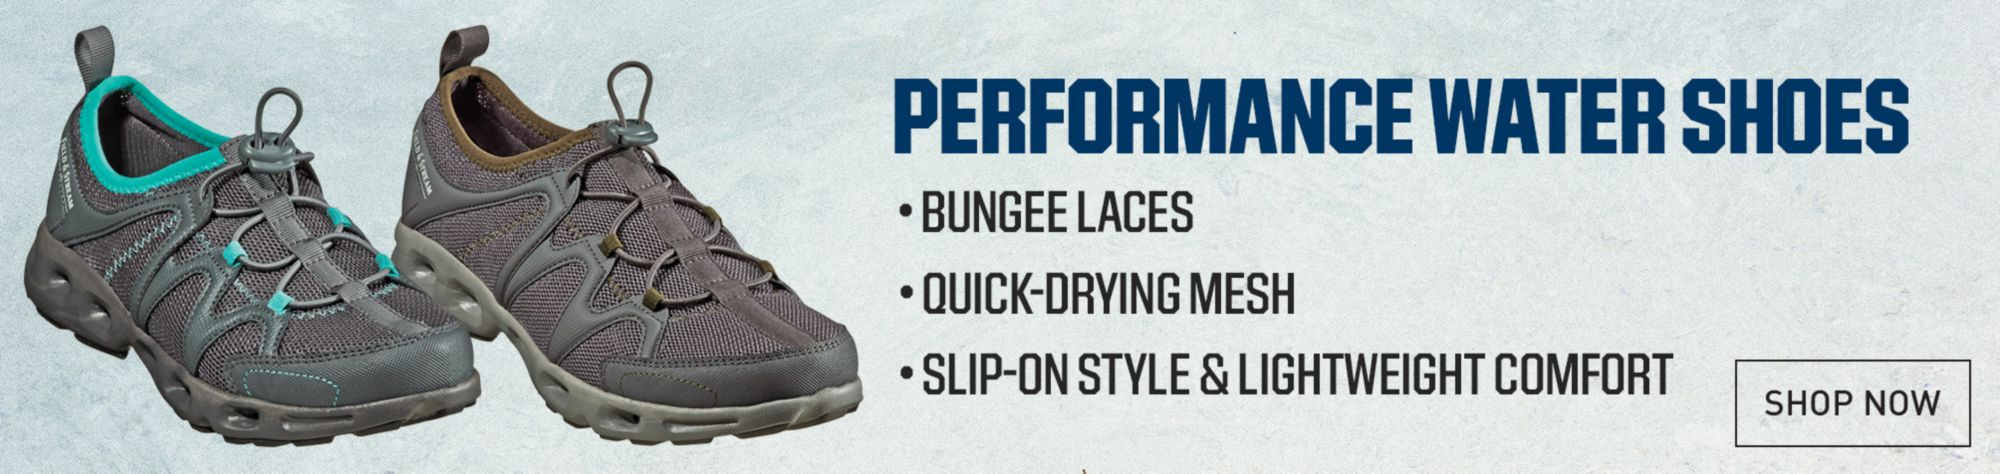 Shower Shoes For Basic Training